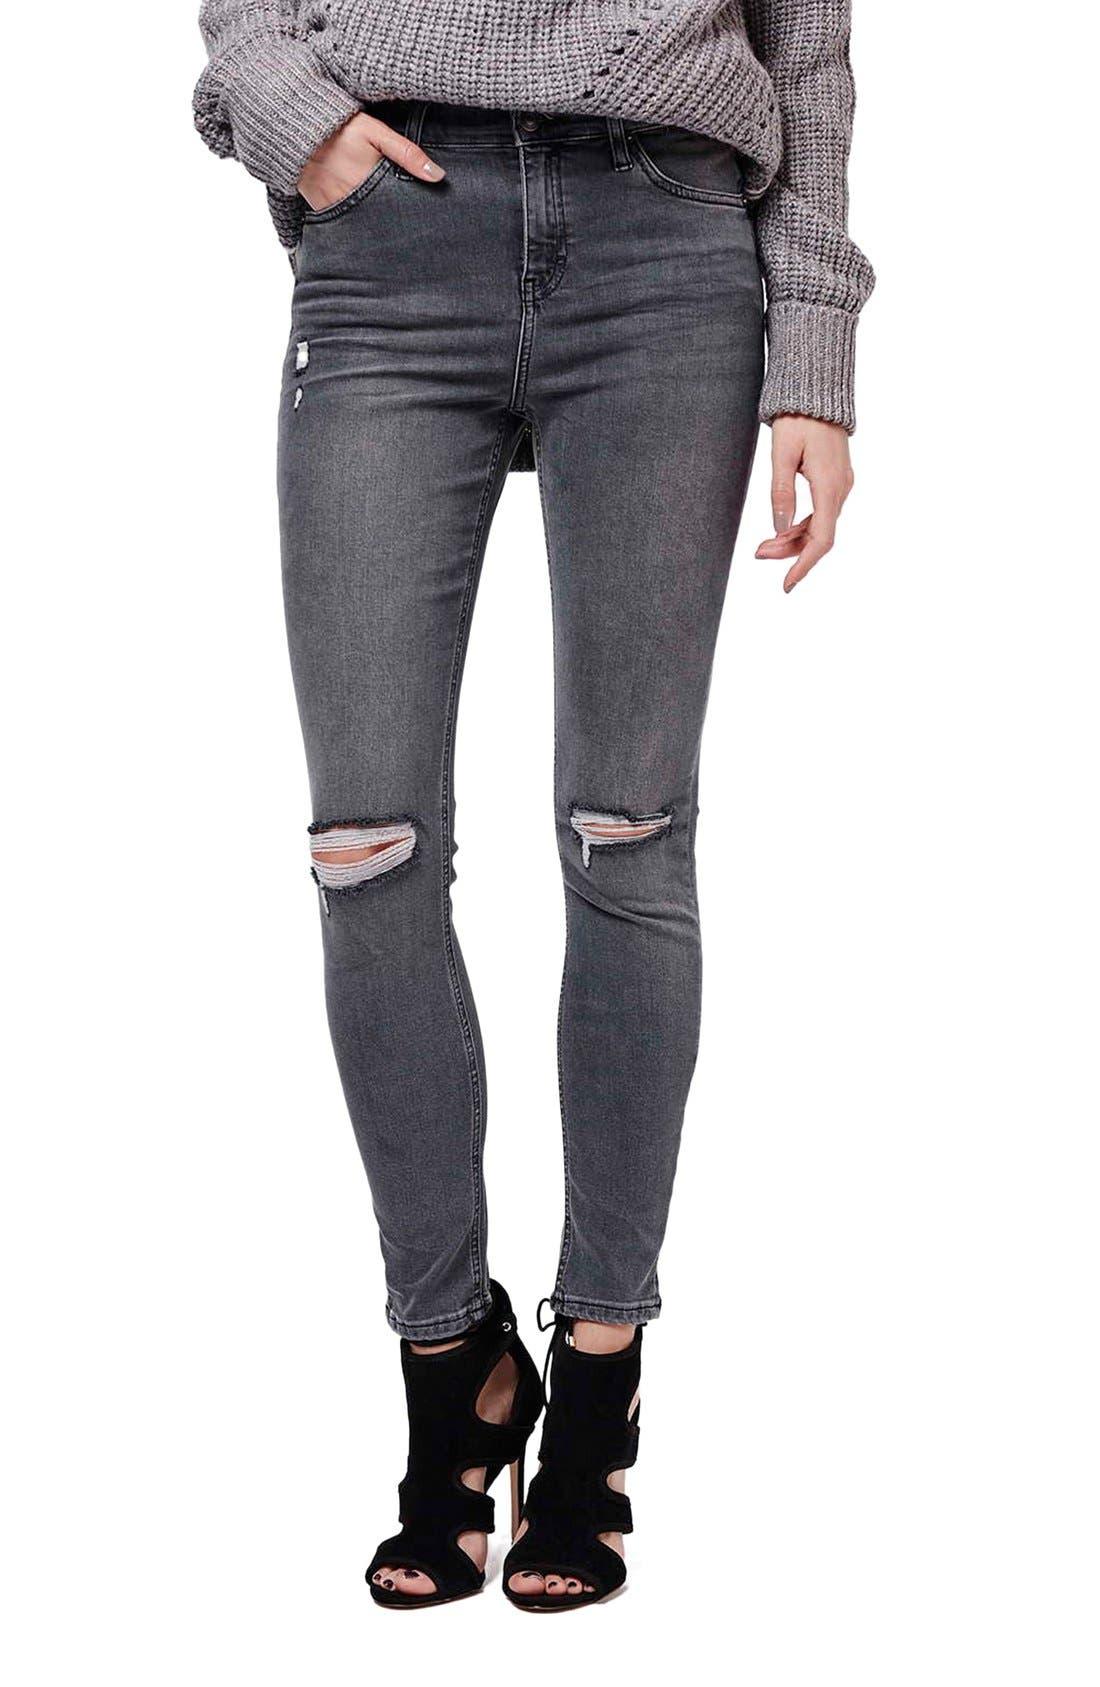 Main Image - Topshop 'Jamie' Ripped Skinny Jeans (Grey)